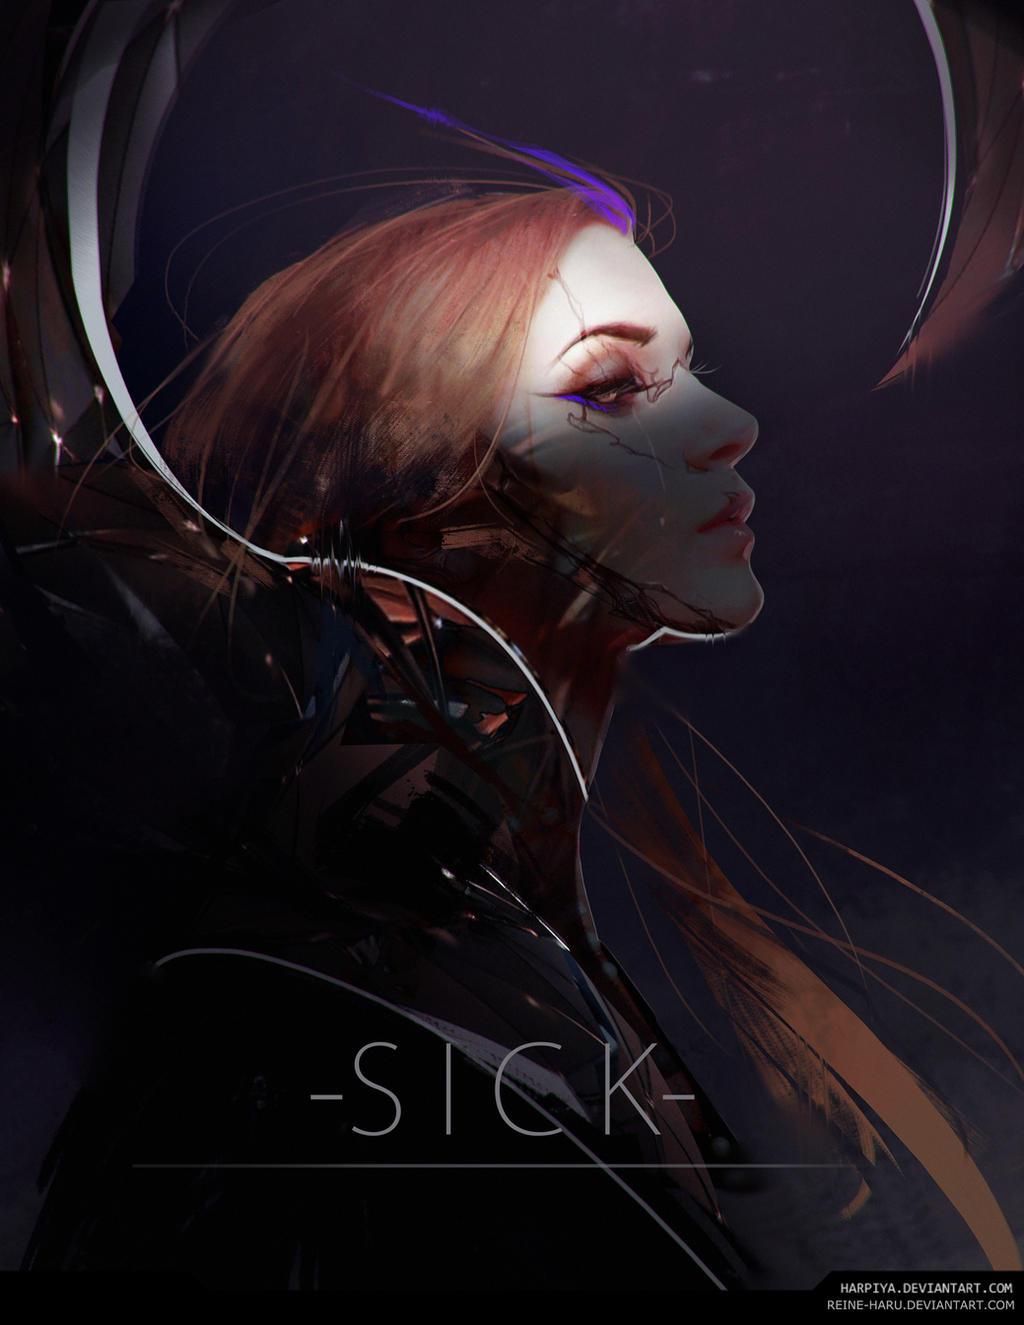 -Sick- by Harpiya